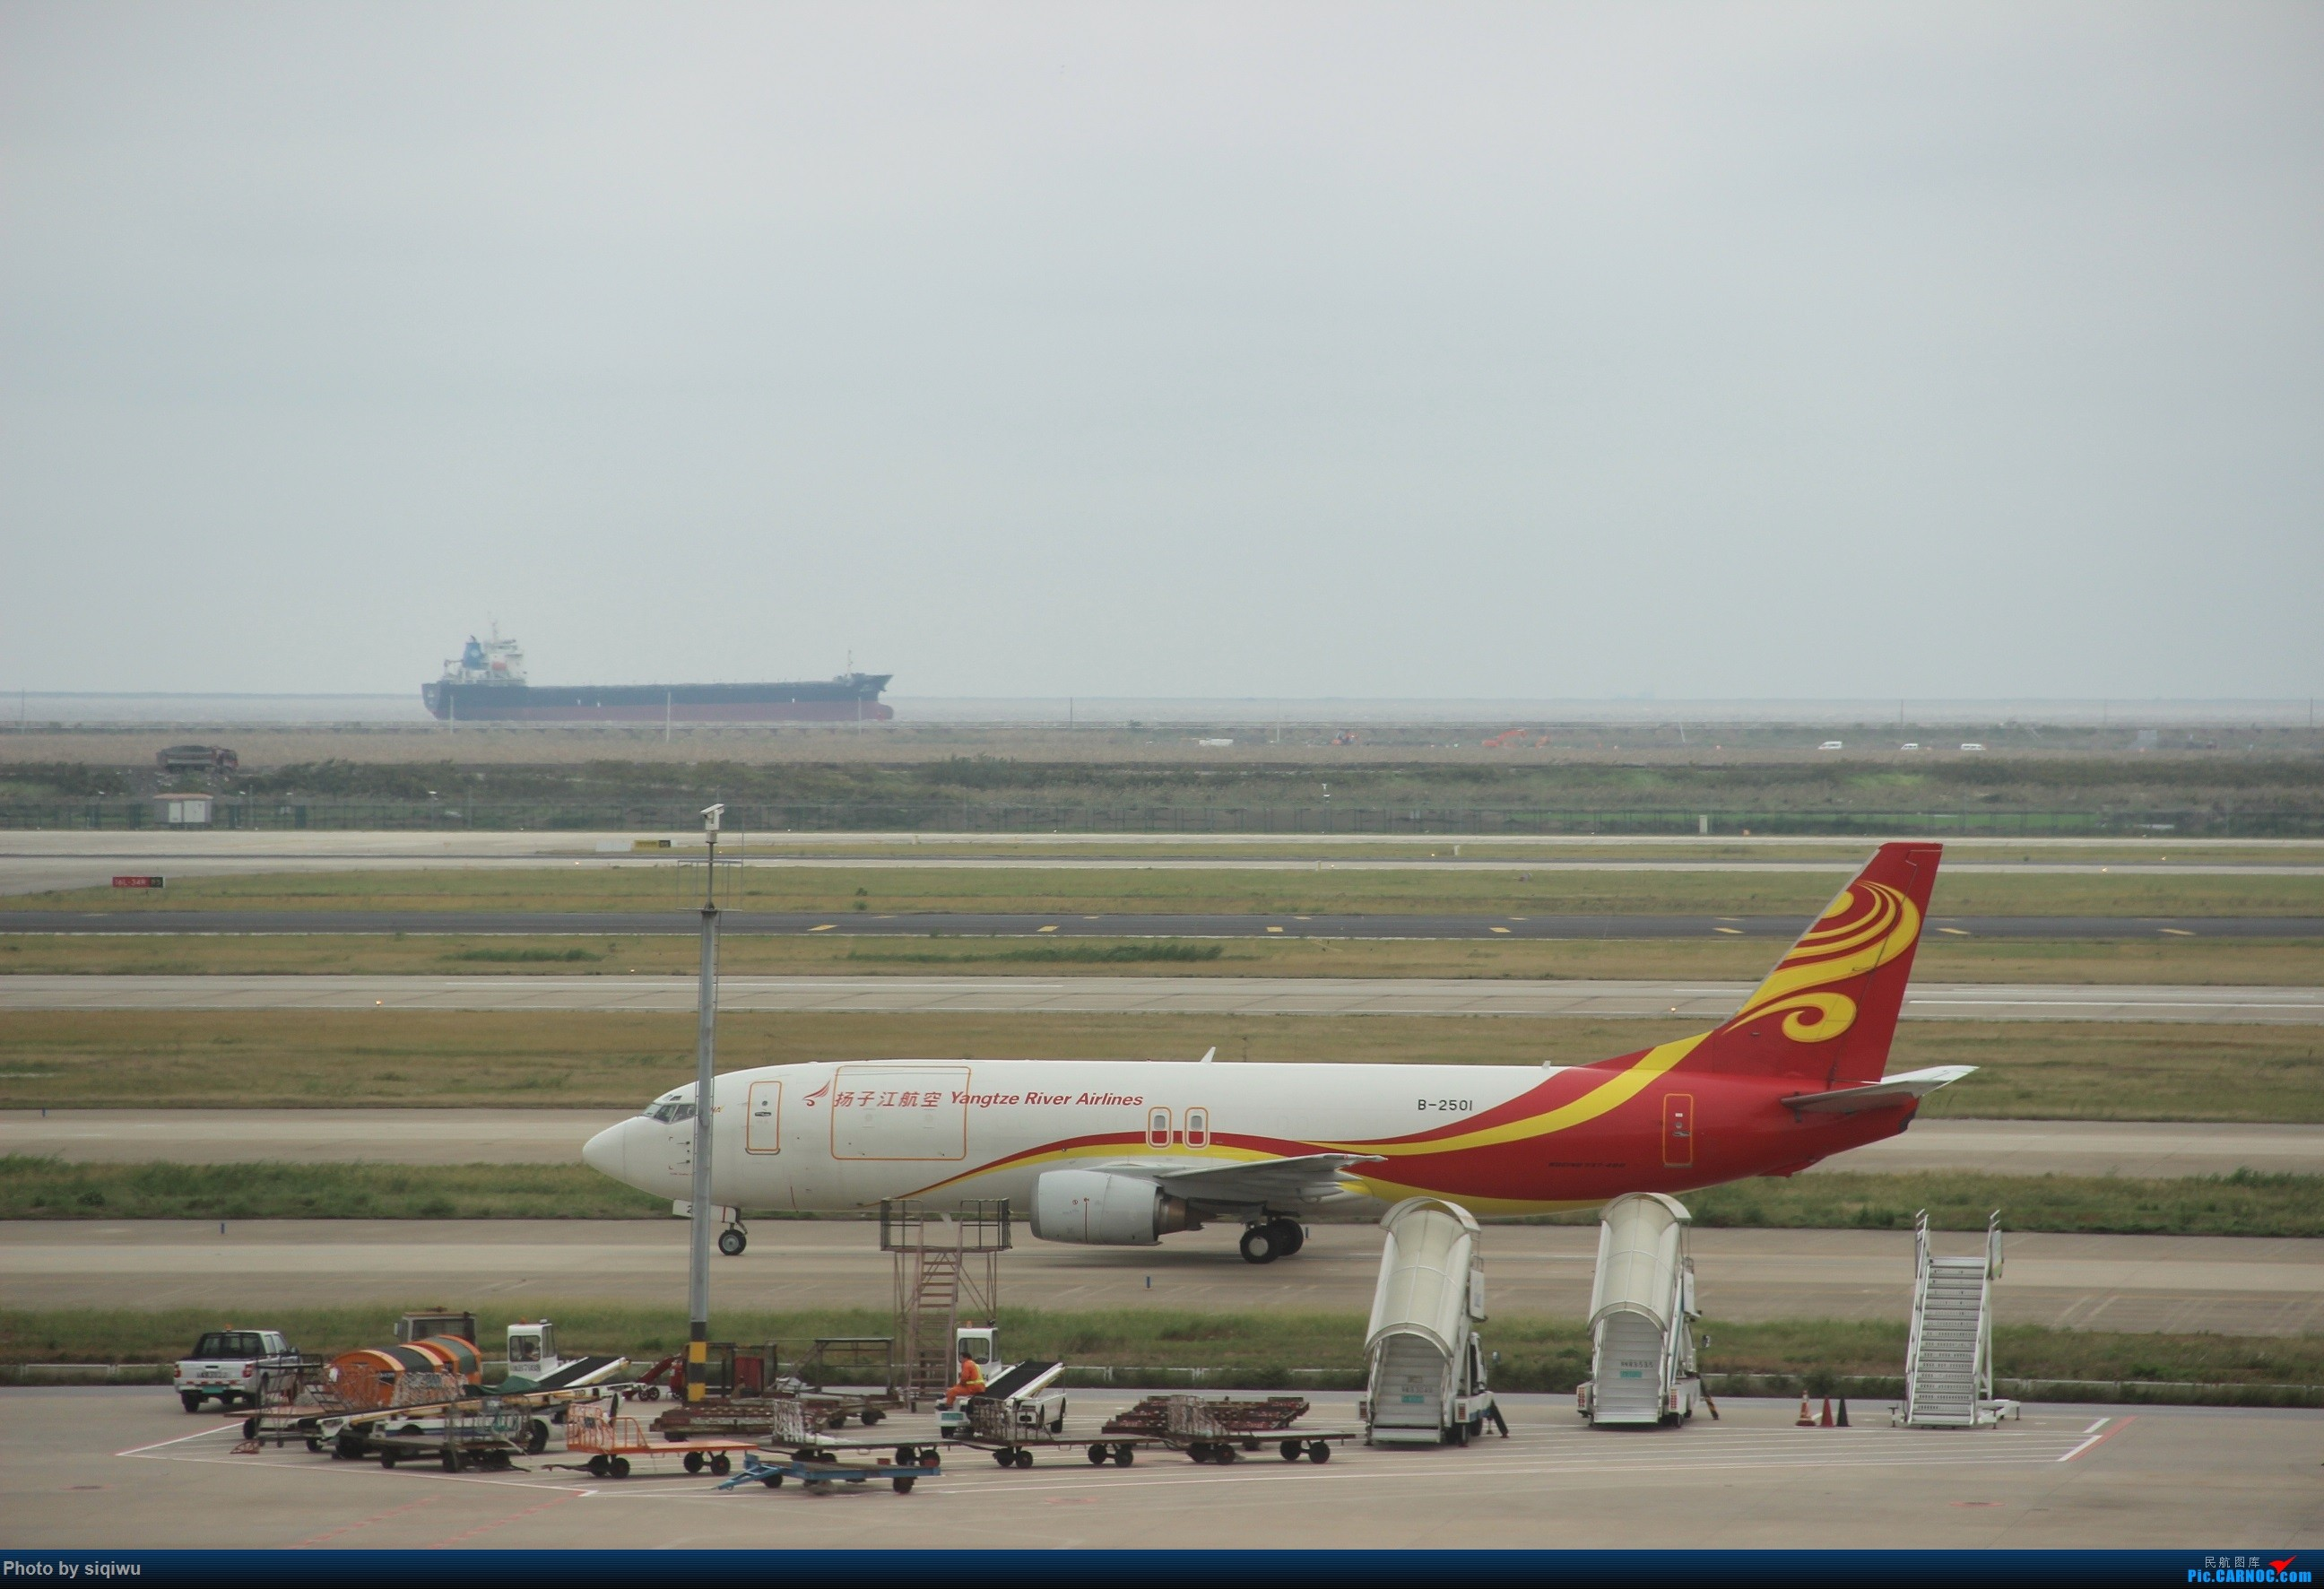 Re:[原创]PVG-HKG-KUL-HKG-PVG 四天往返,CX/KA BOEING 737-700  中国上海浦东国际机场